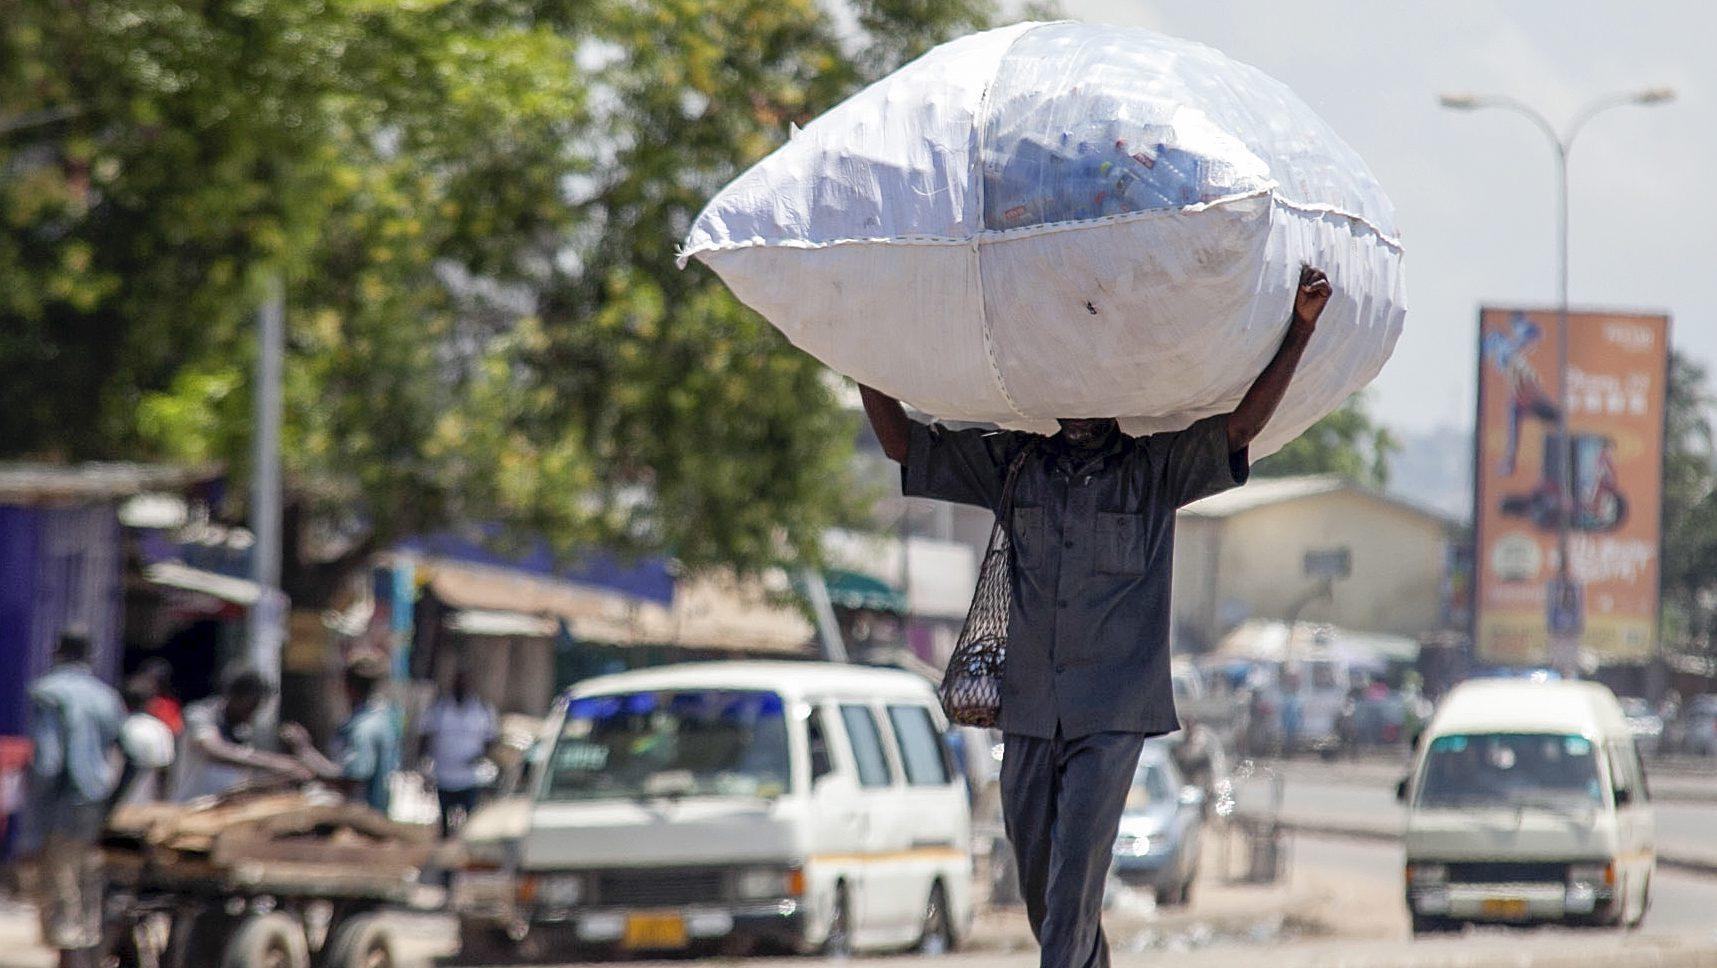 Ghana, the world's fastest growing economy, has a trash